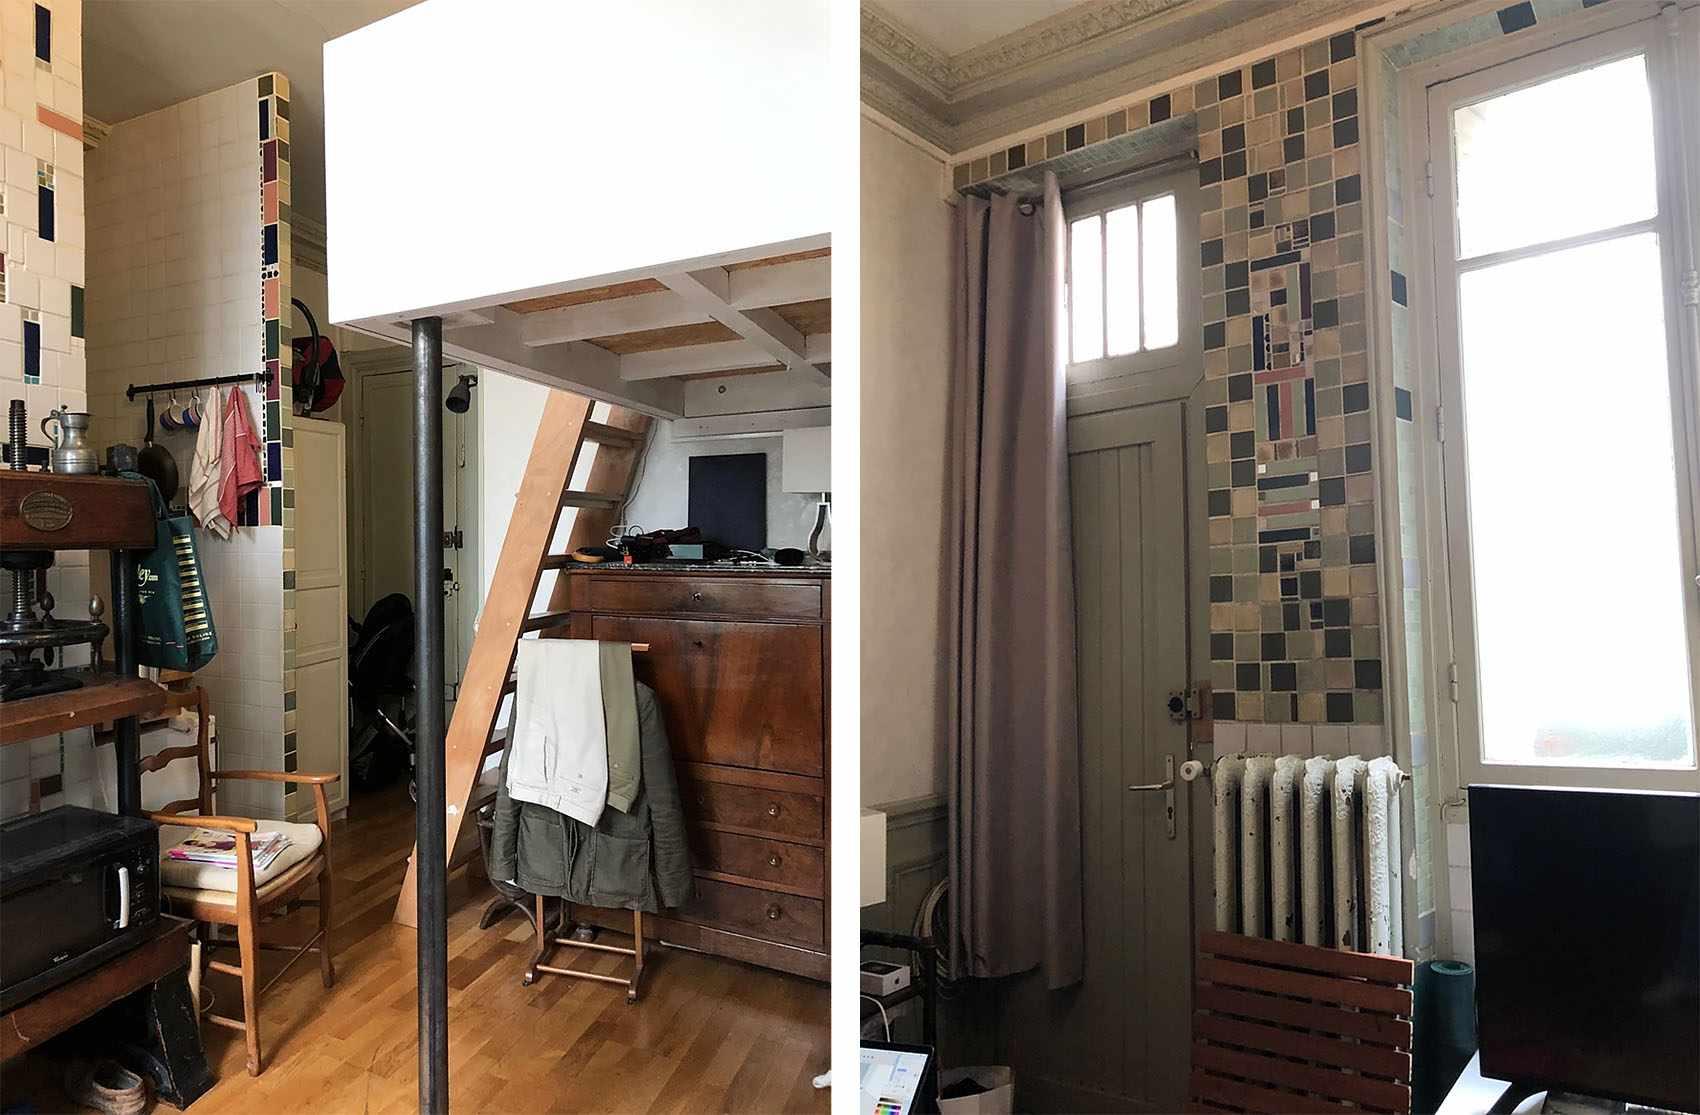 Boulevard Arago apartment renovation Studio Beau Faire previous layout